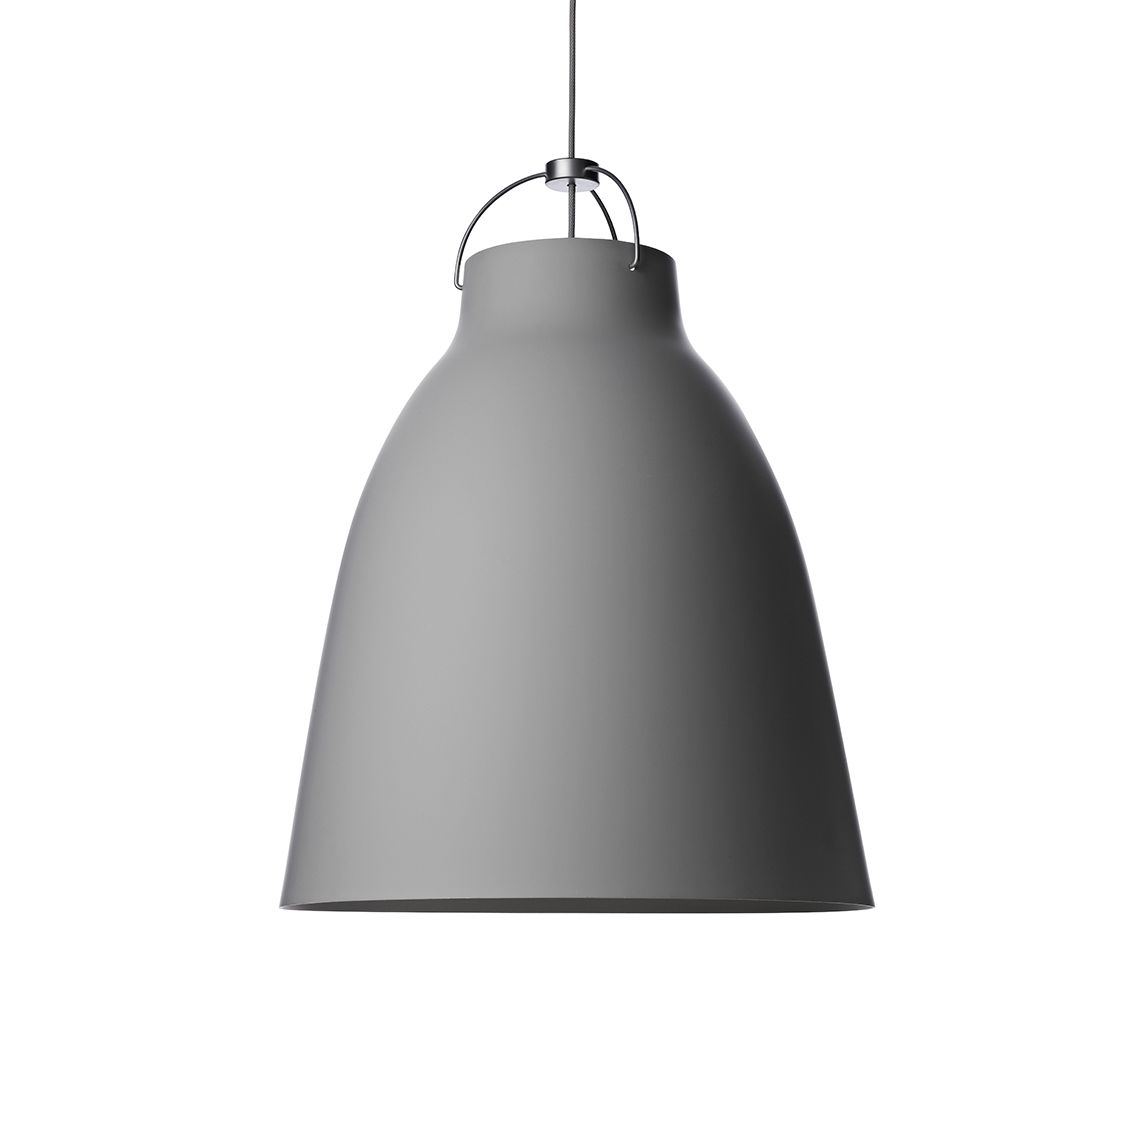 Caravaggio hanglamp Lightyears Ø26 mat grijs 45